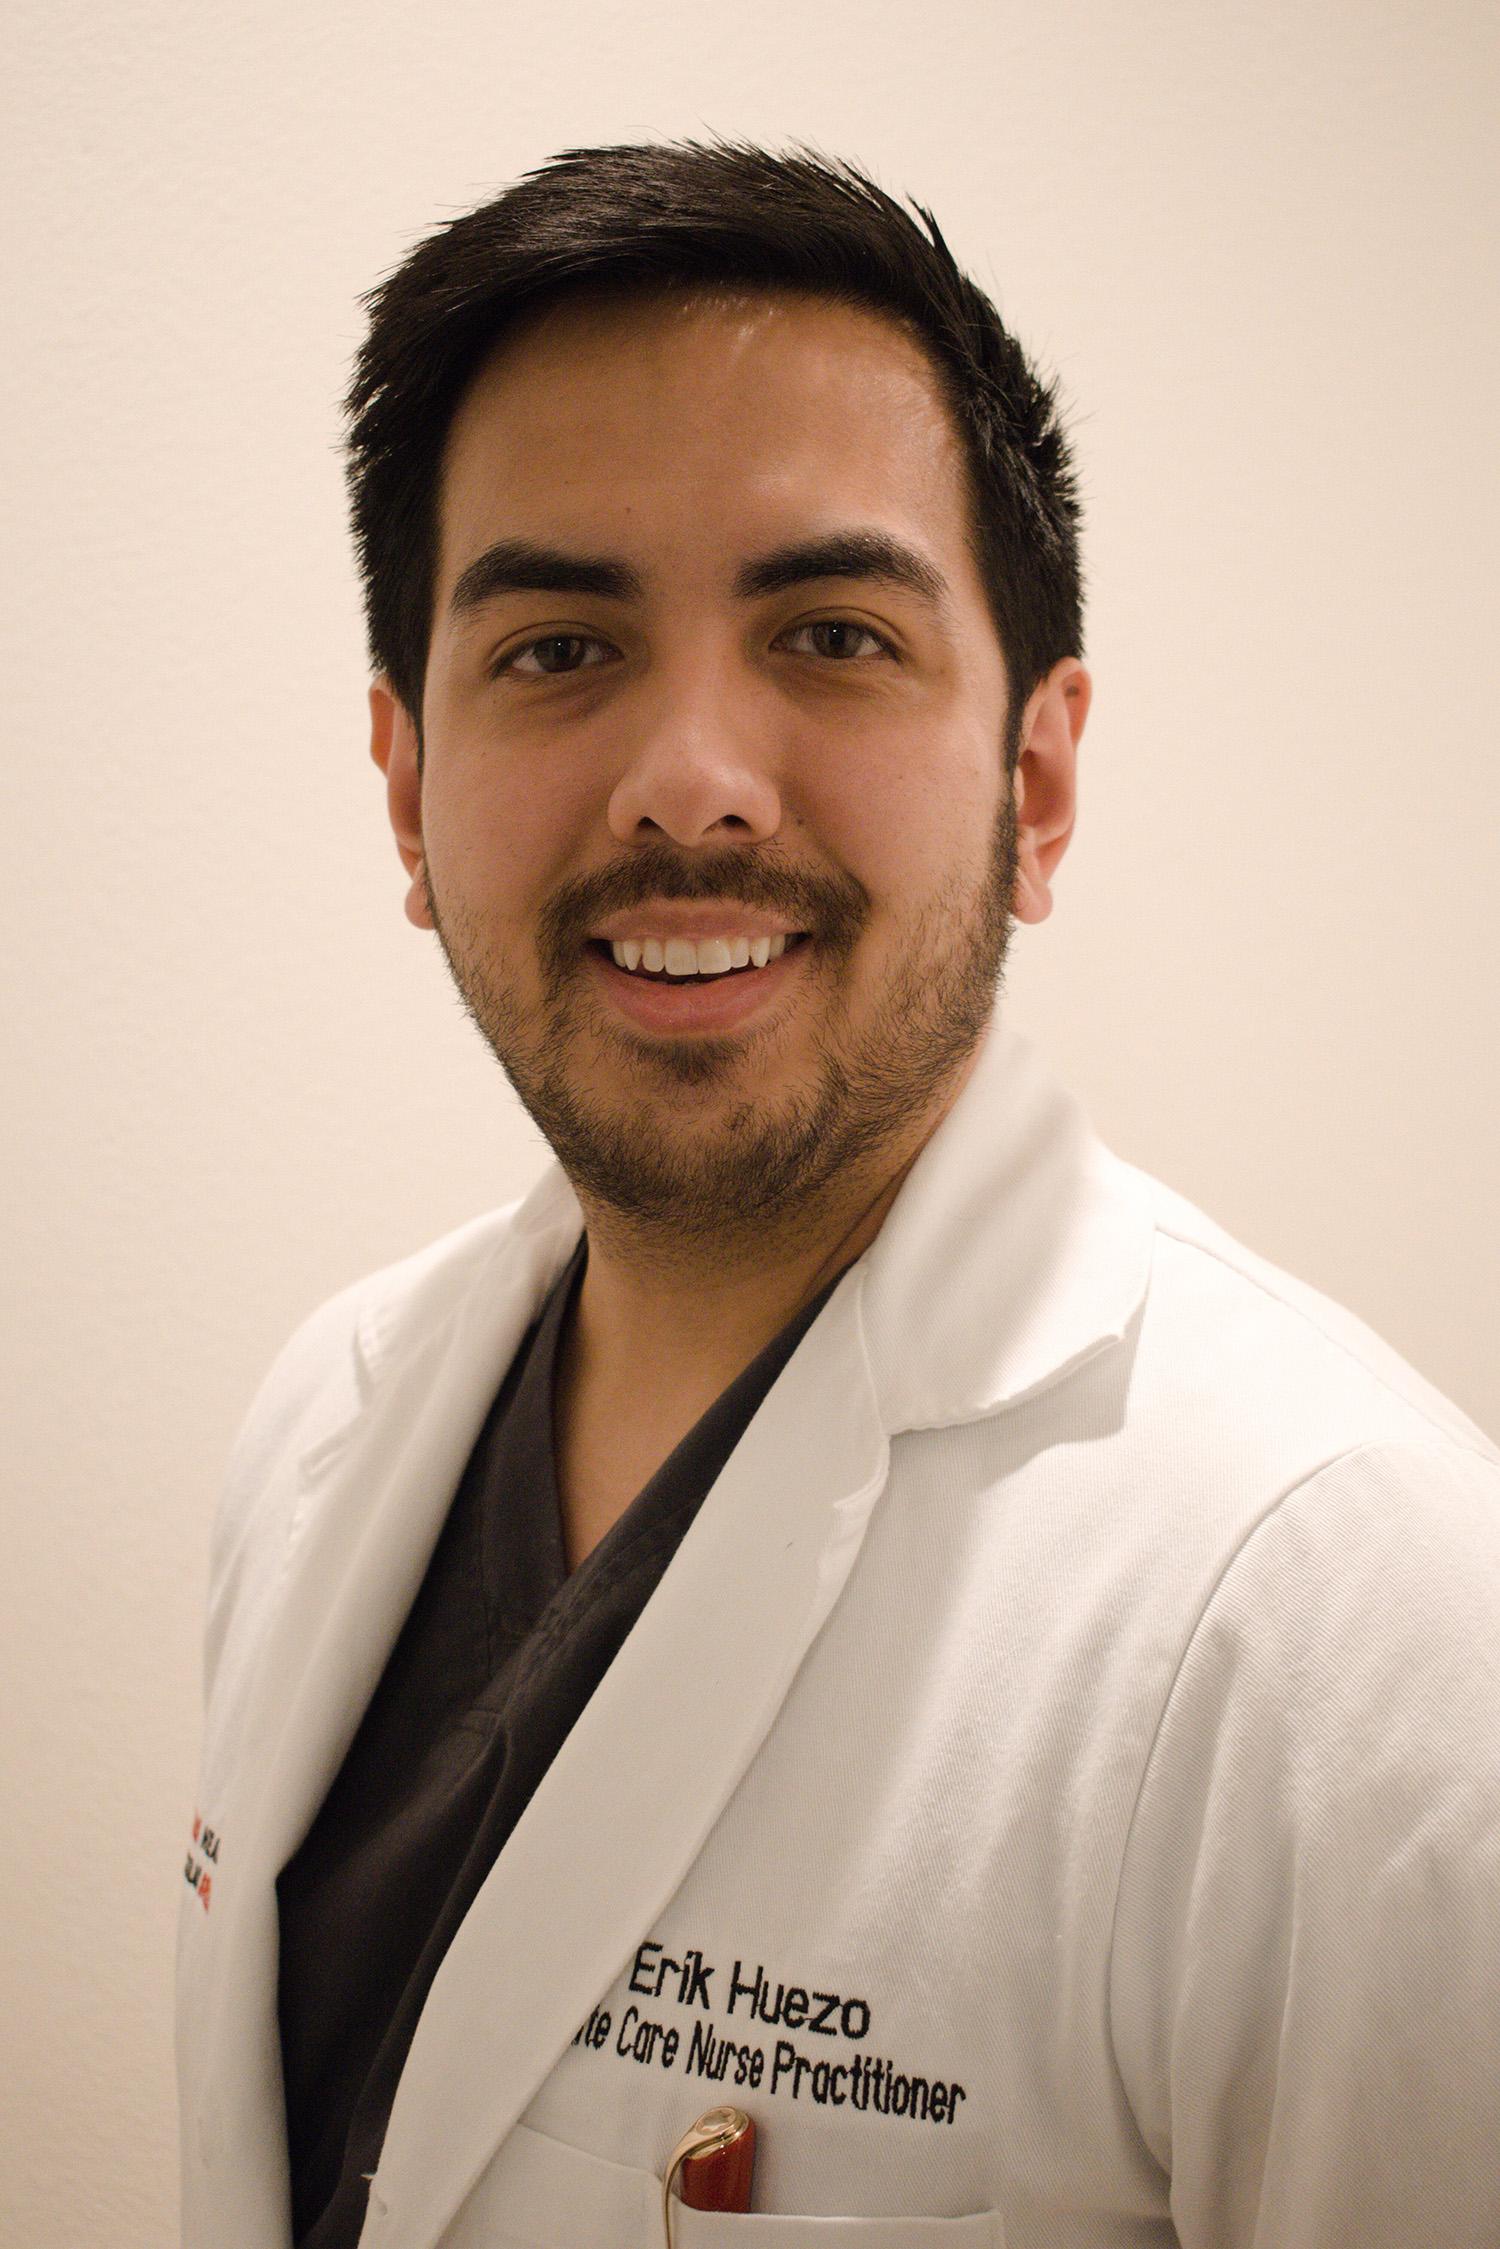 Erik Huezo, Nurse Practitioner